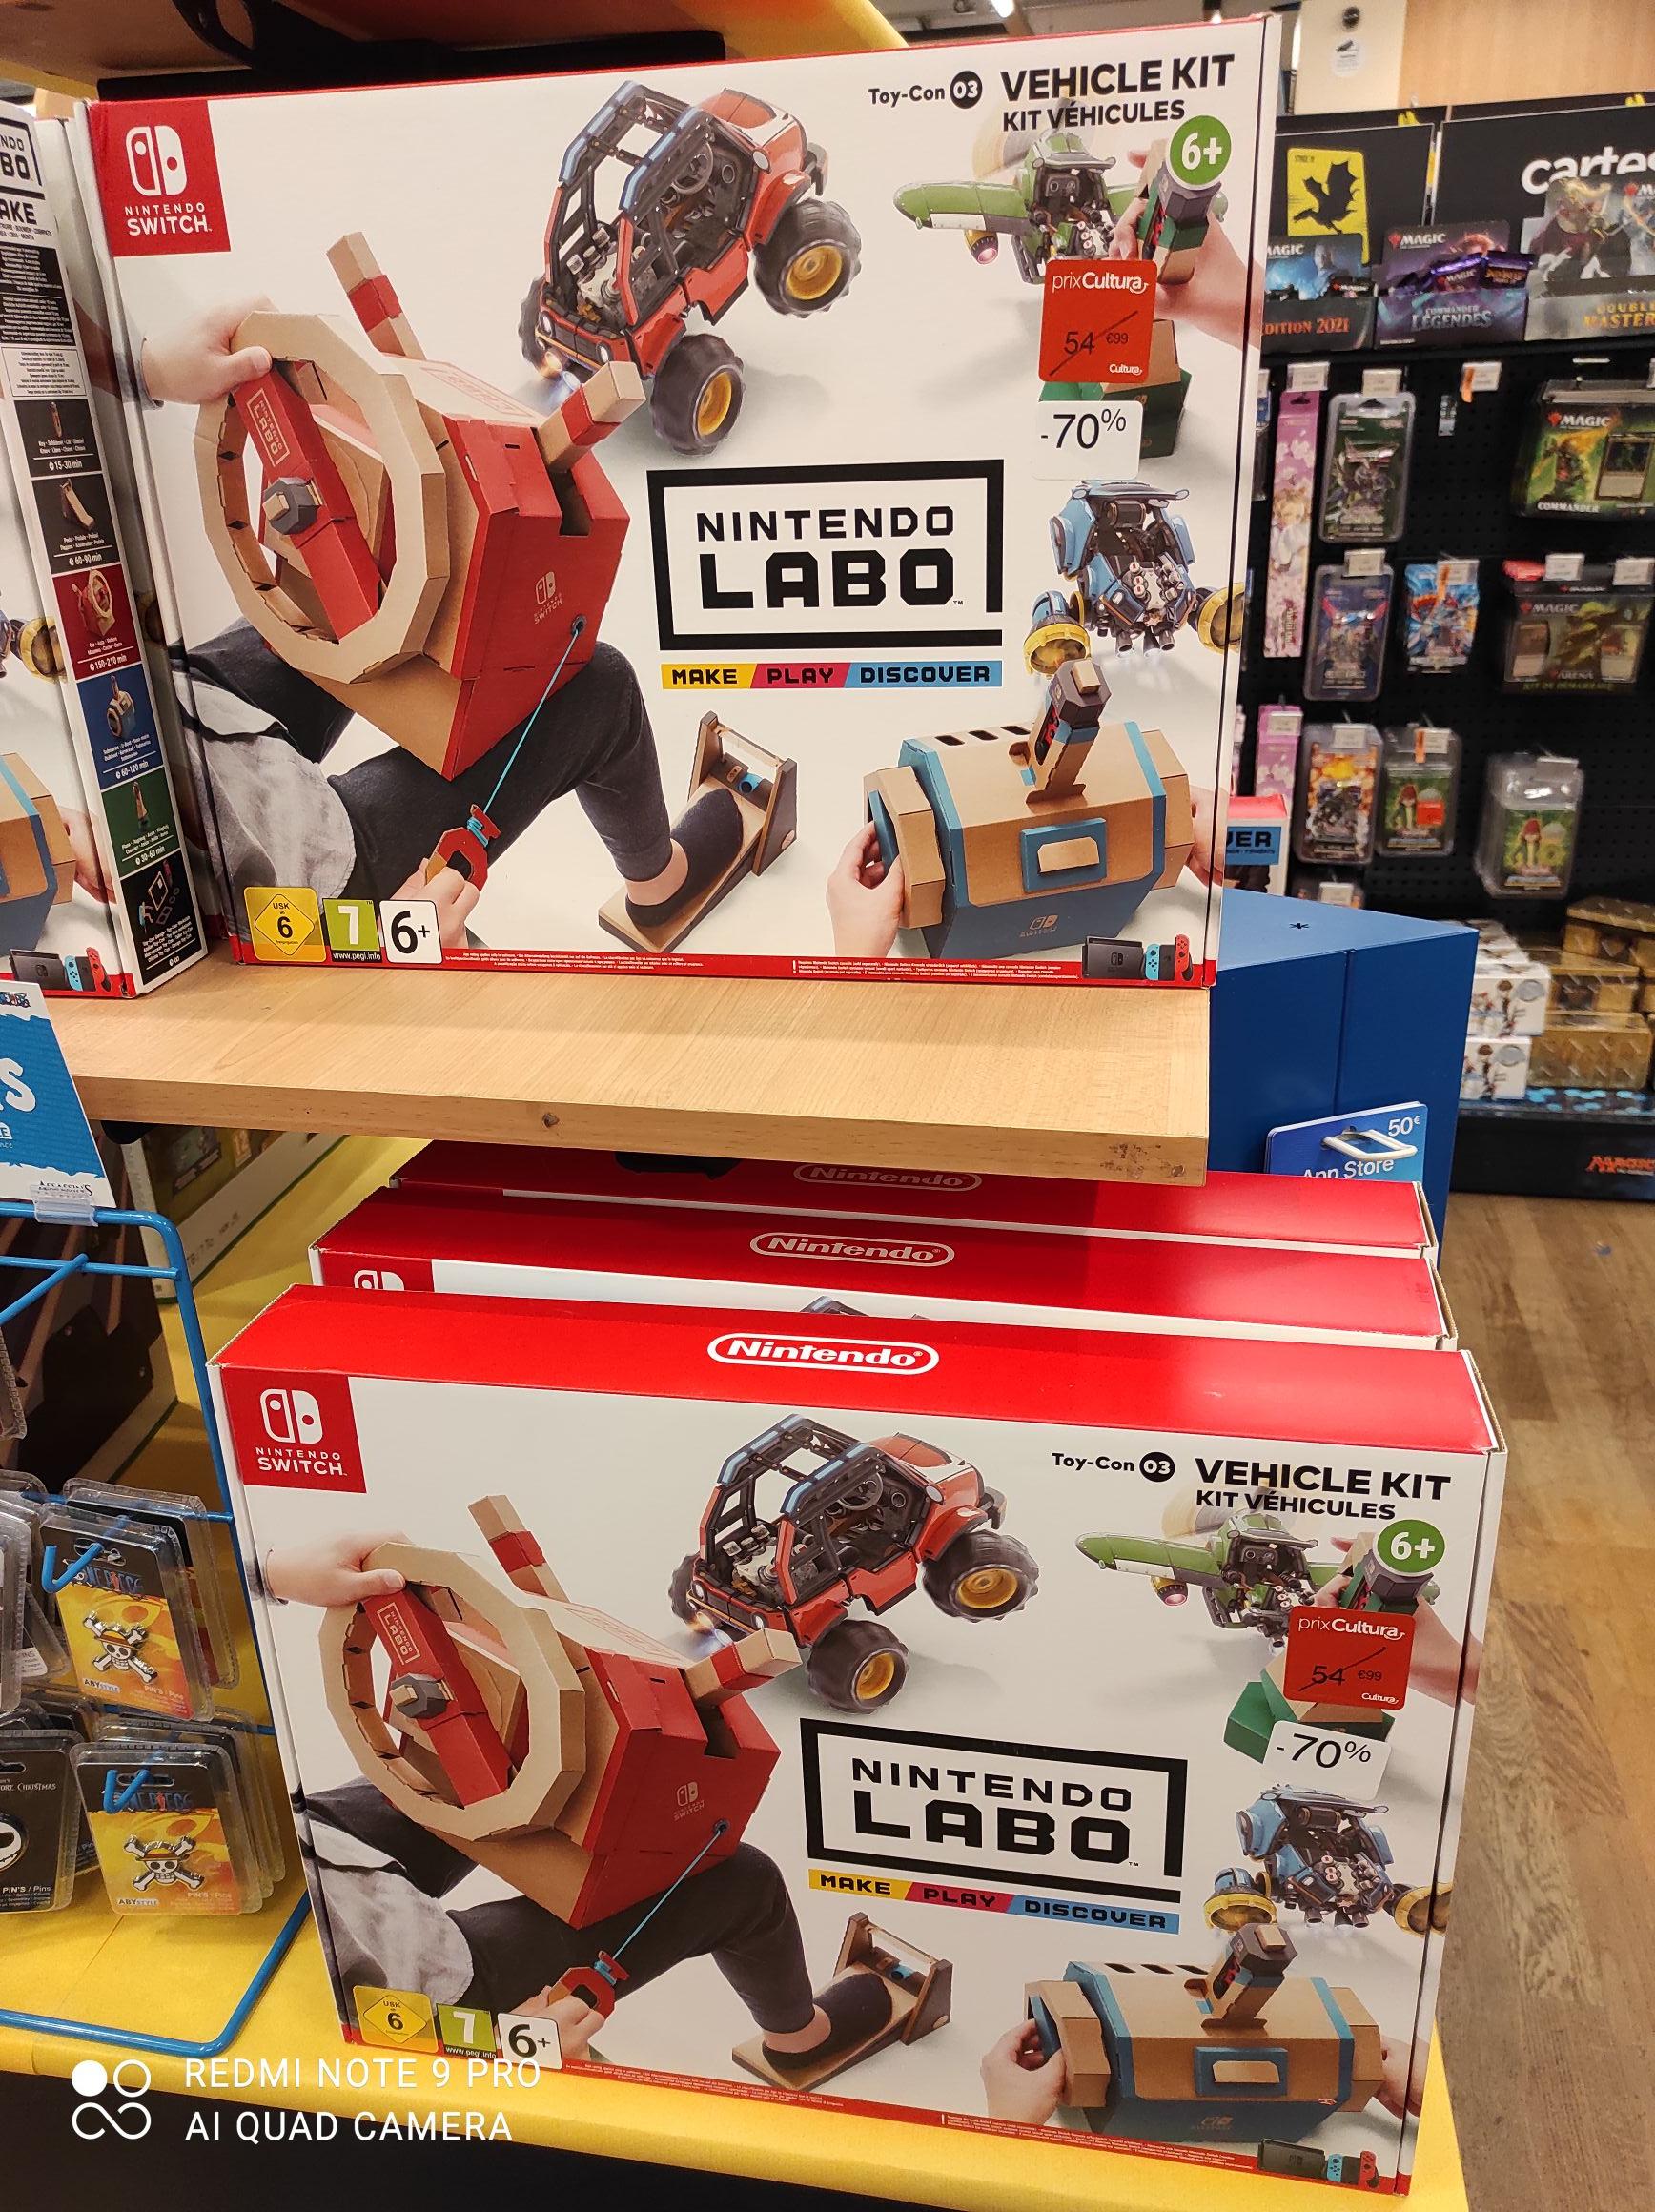 Nintendo Labo véhicule kit - Plaisir (78)